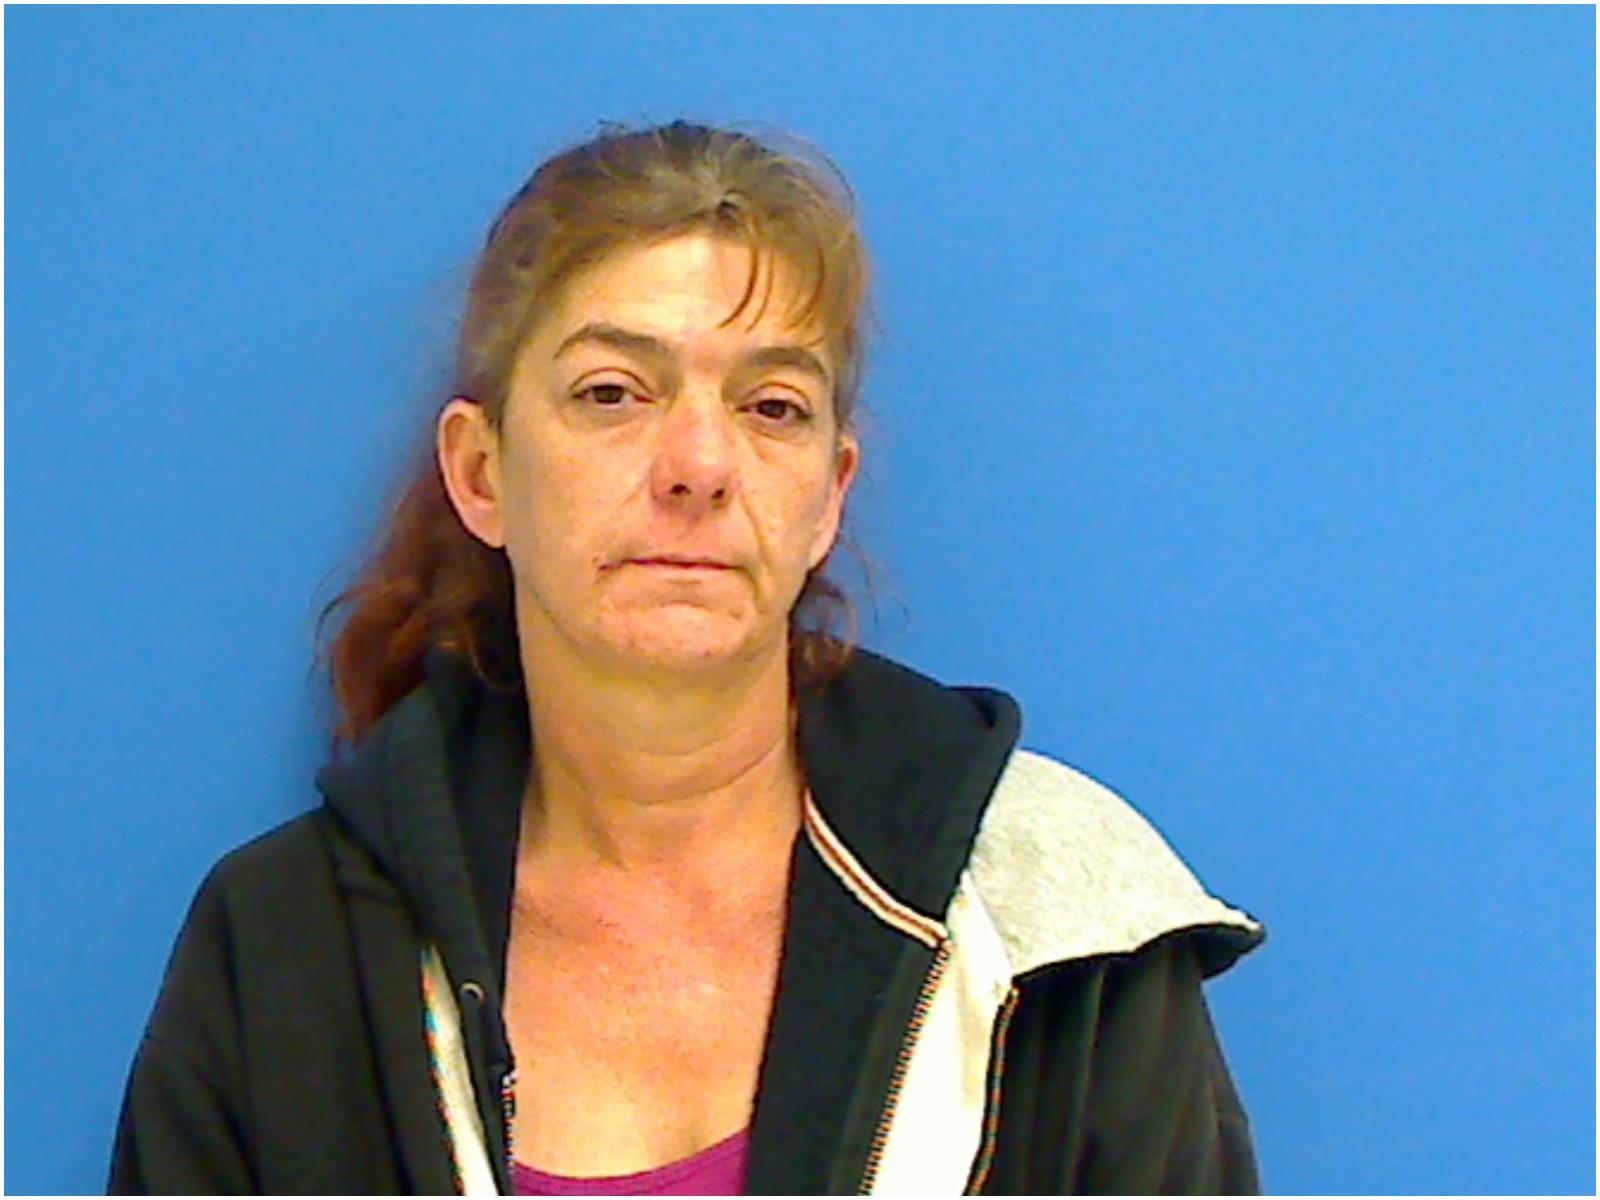 Defendant Tina Swink